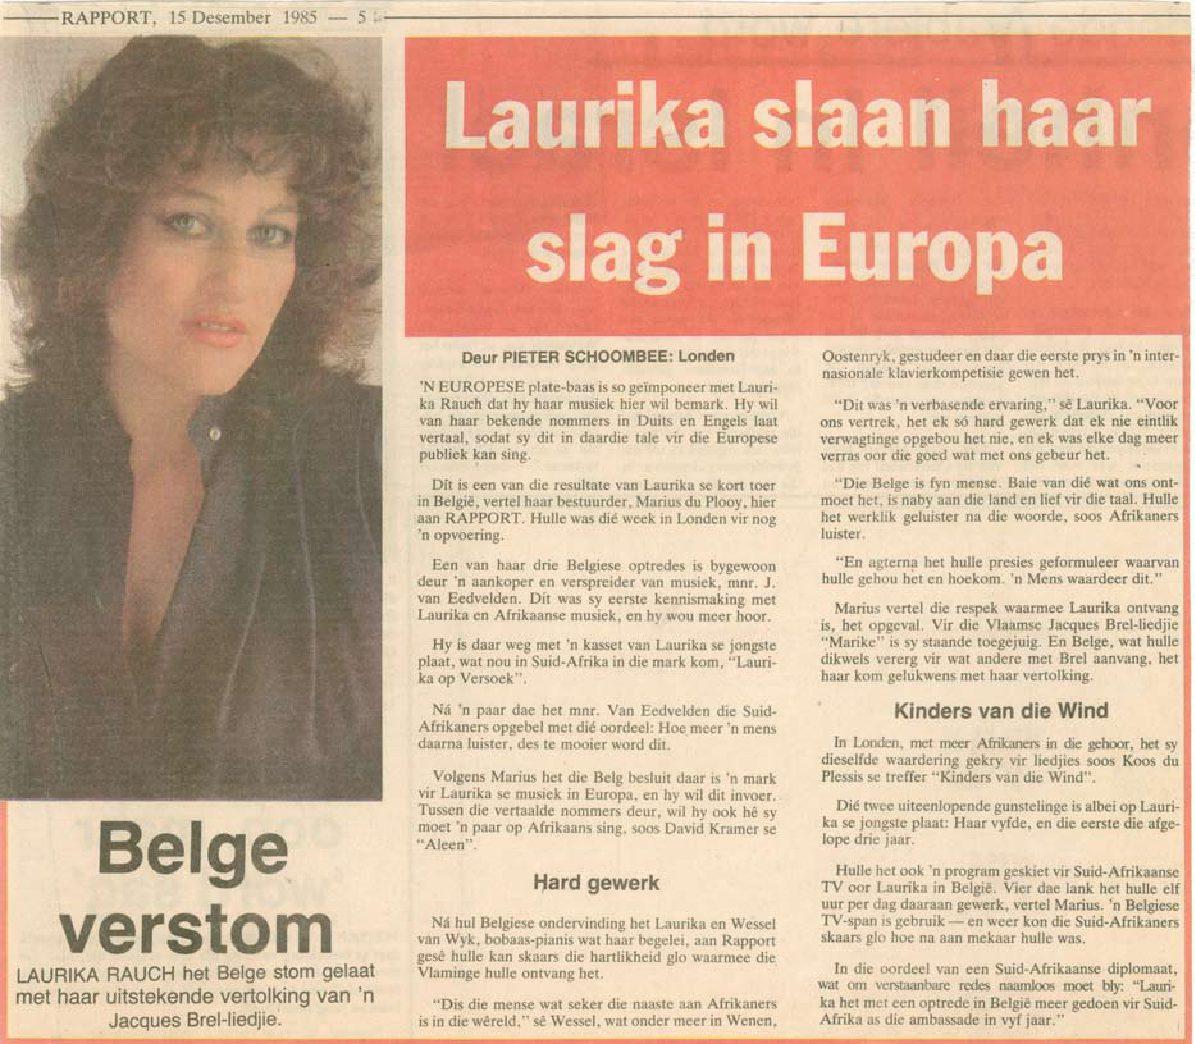 1984-rapport-laurika-slaan-slag-in-europa